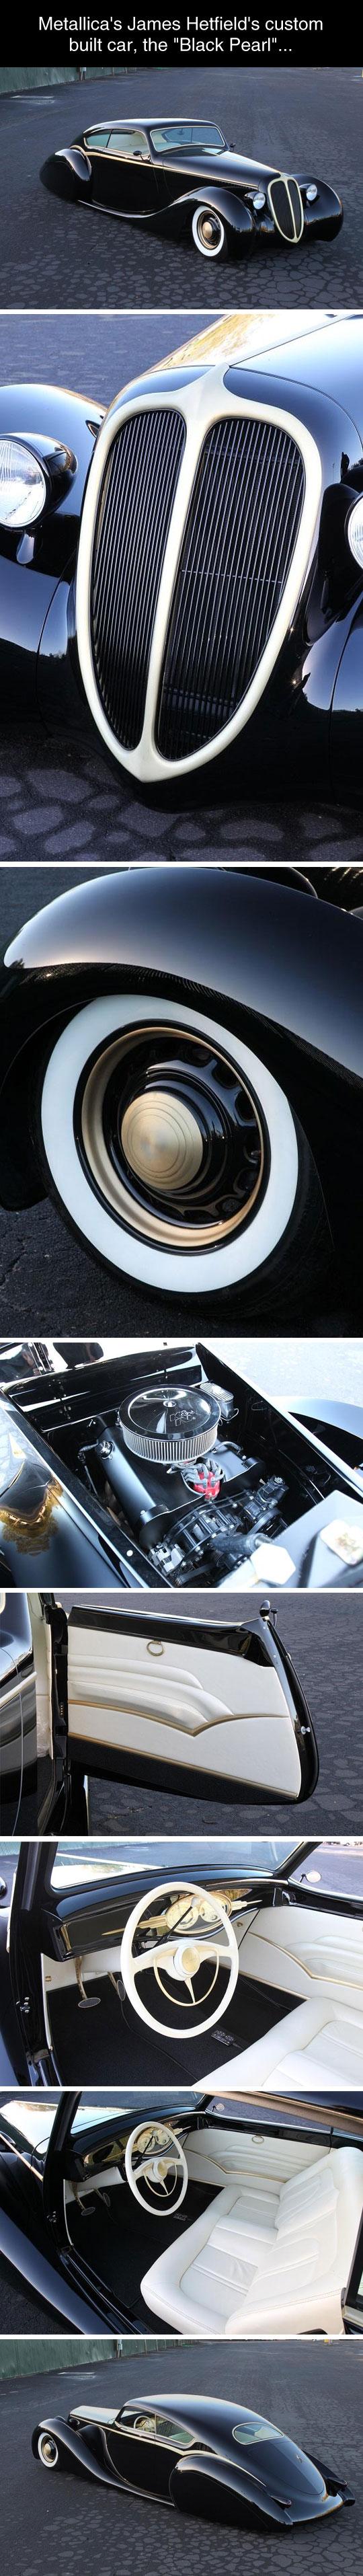 James-Hetfield-custom-made-car